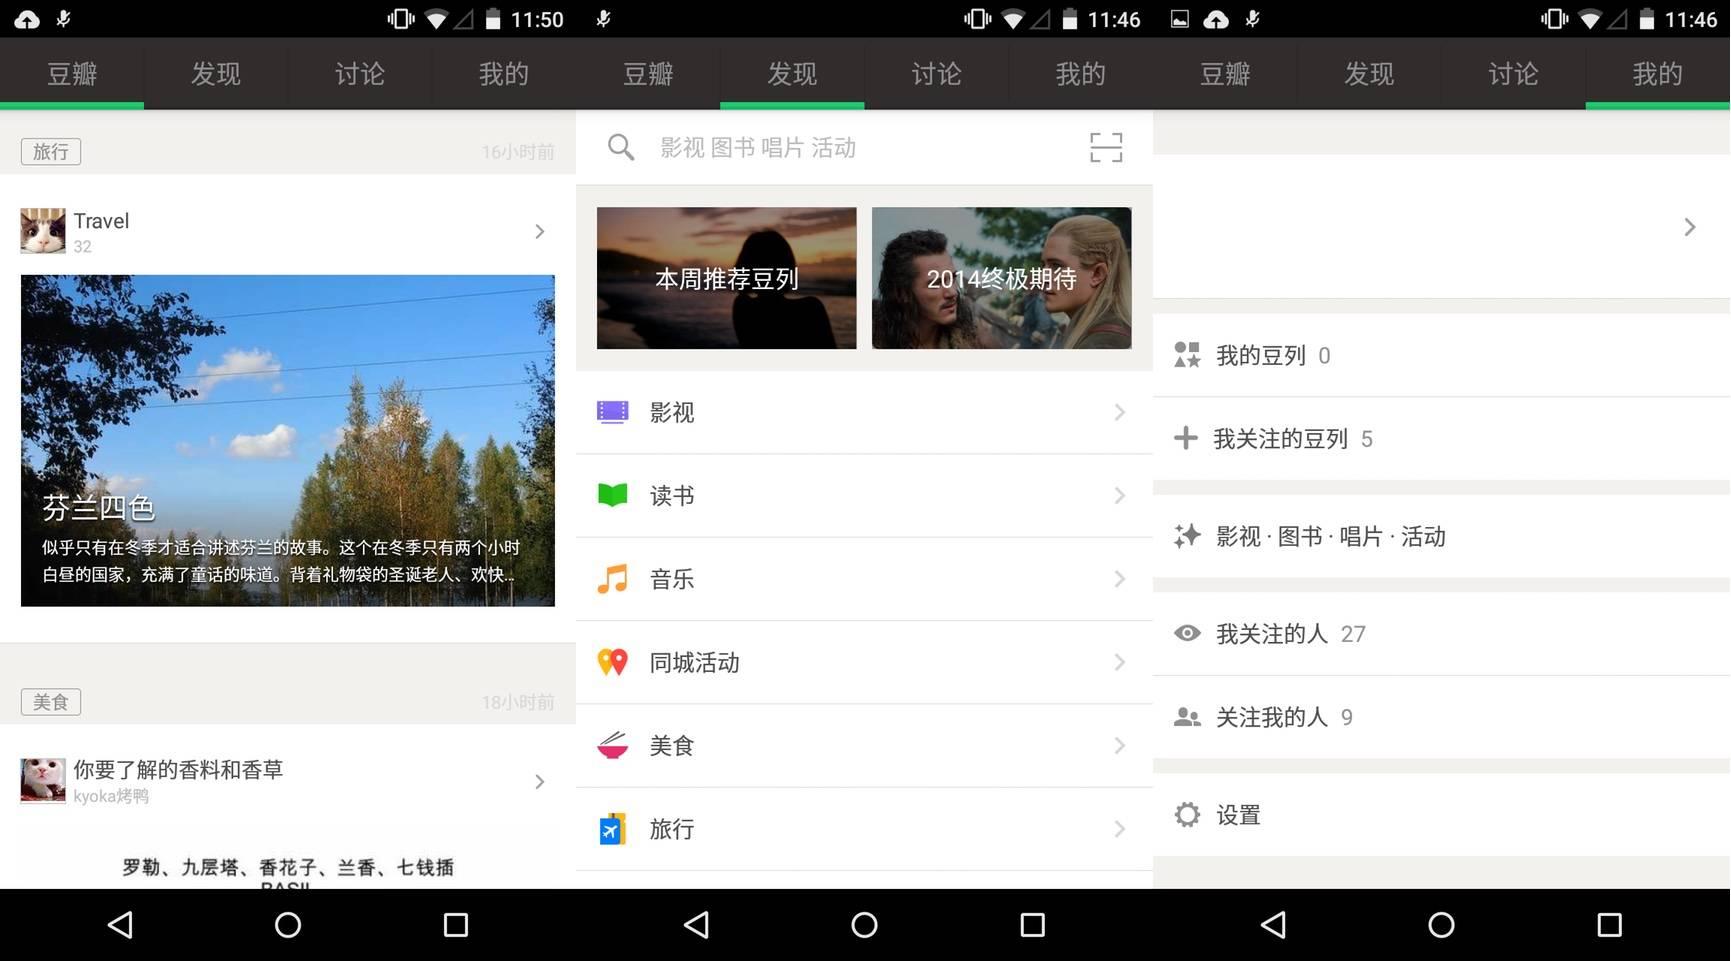 douban 2.0